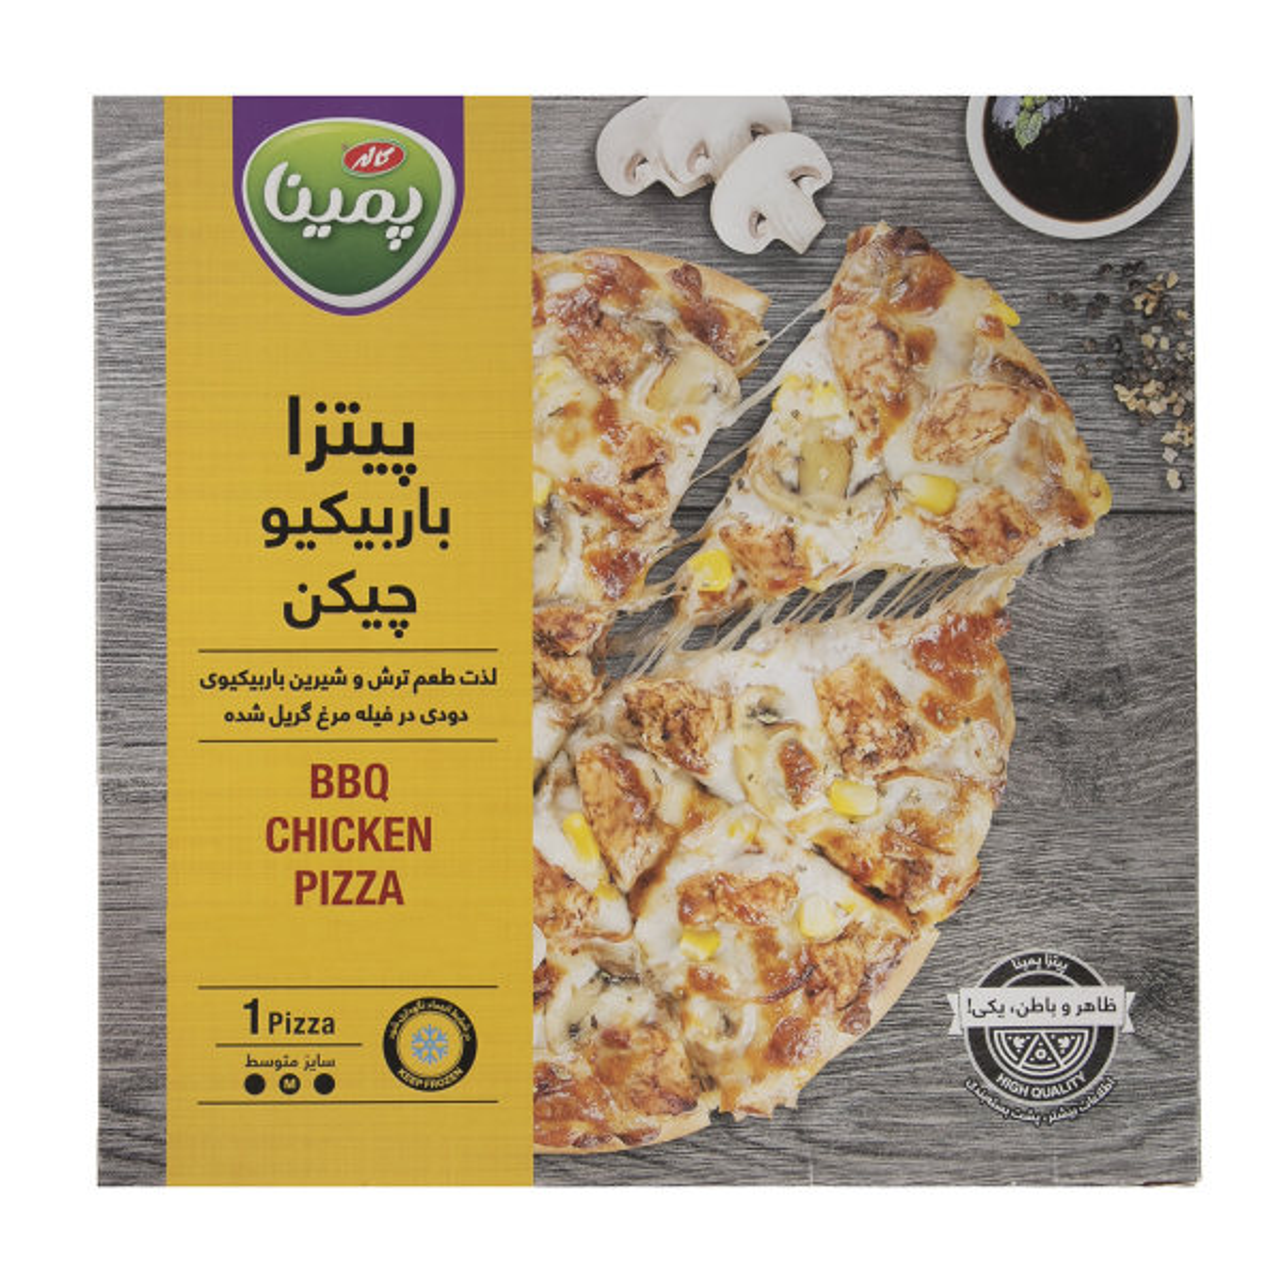 پیتزا باربیکیو چیکن پمینا کاله مقدار 380 گرم